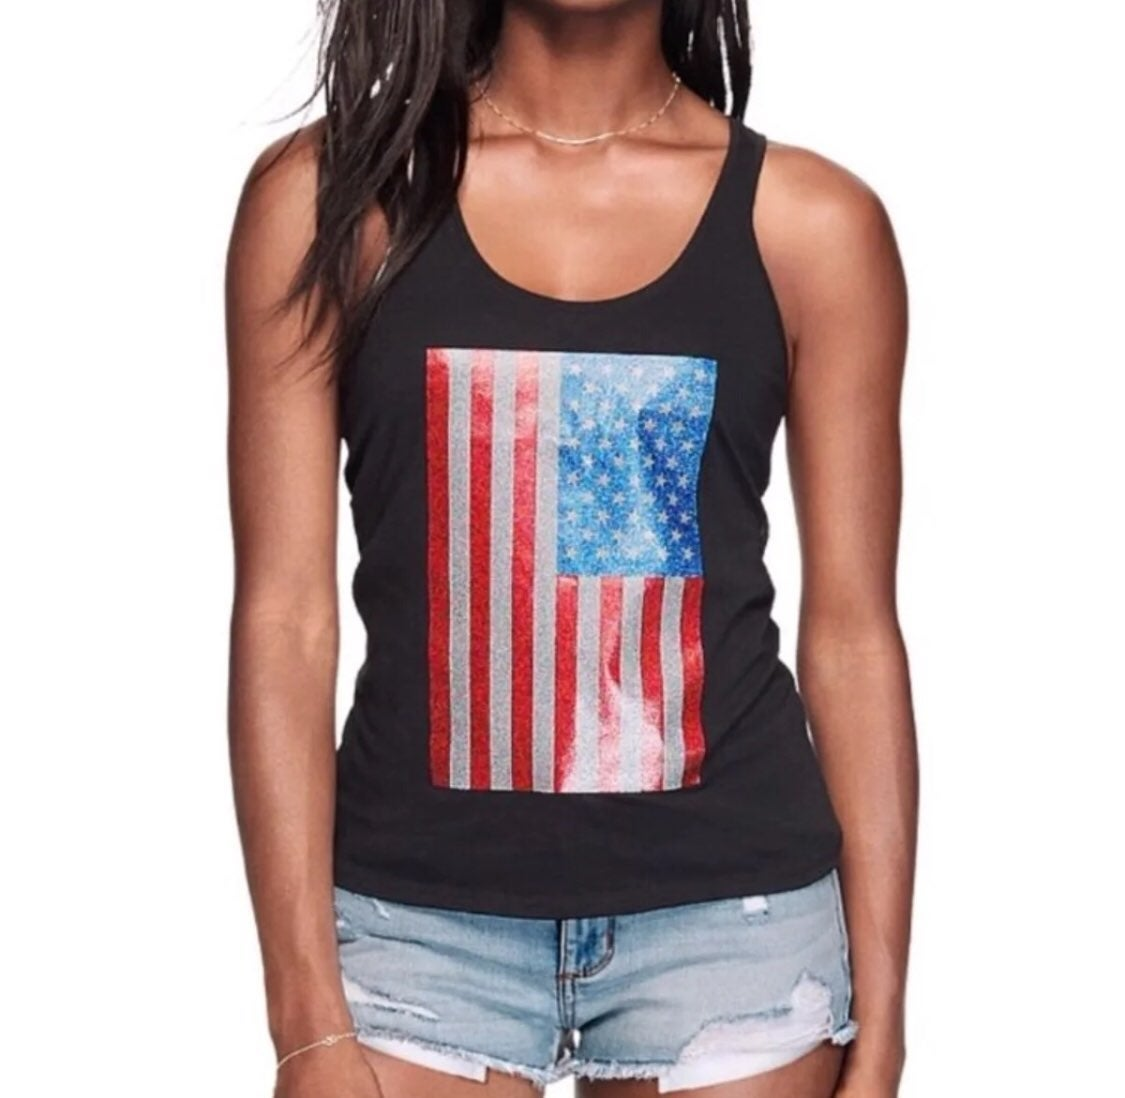 VS PINK AMERICAN FLAG RACERBACK TANK